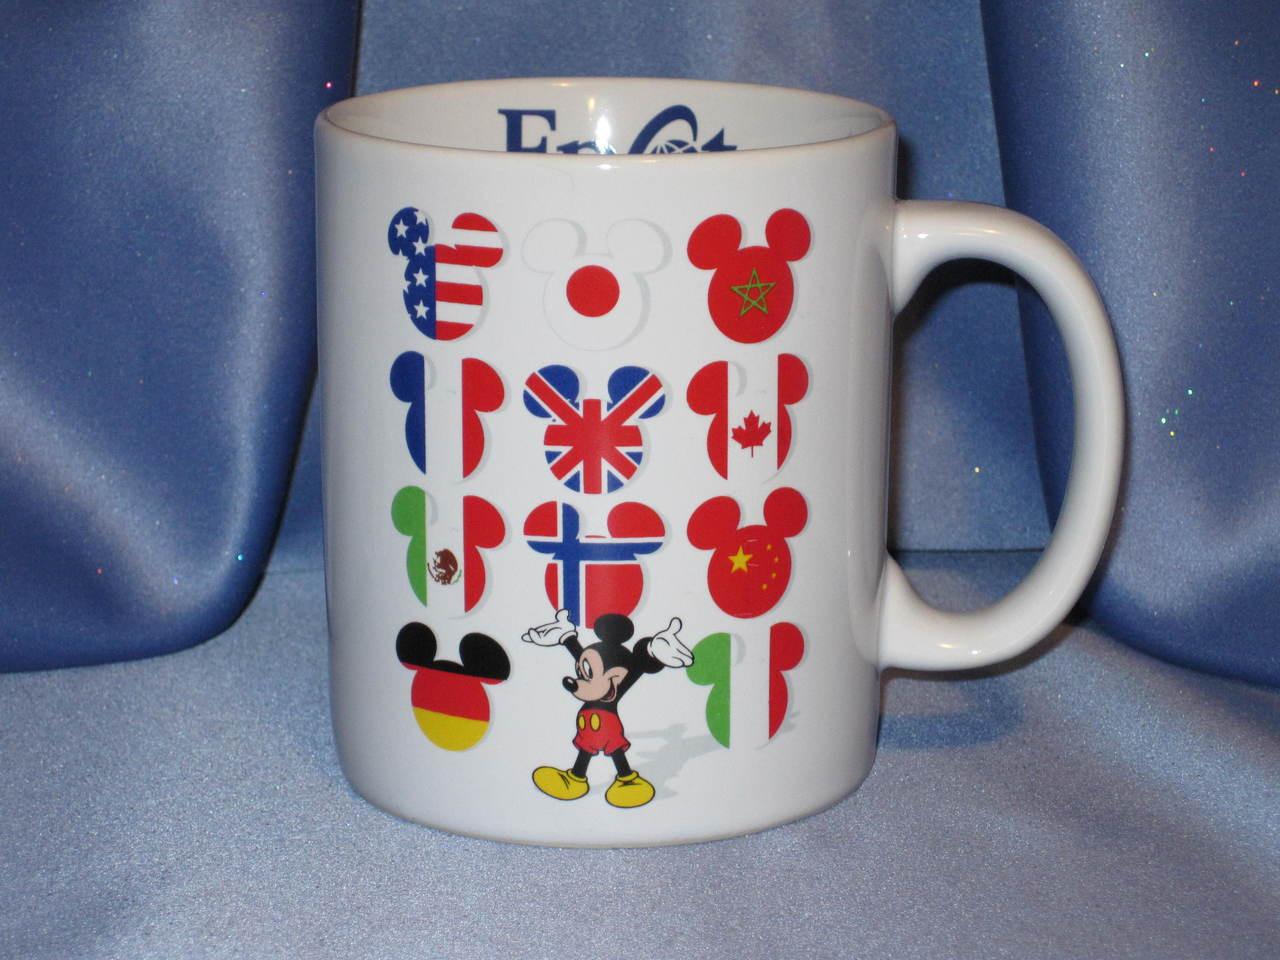 Disney's - Epcot Center - World Flag - Mickey Mouse Mug